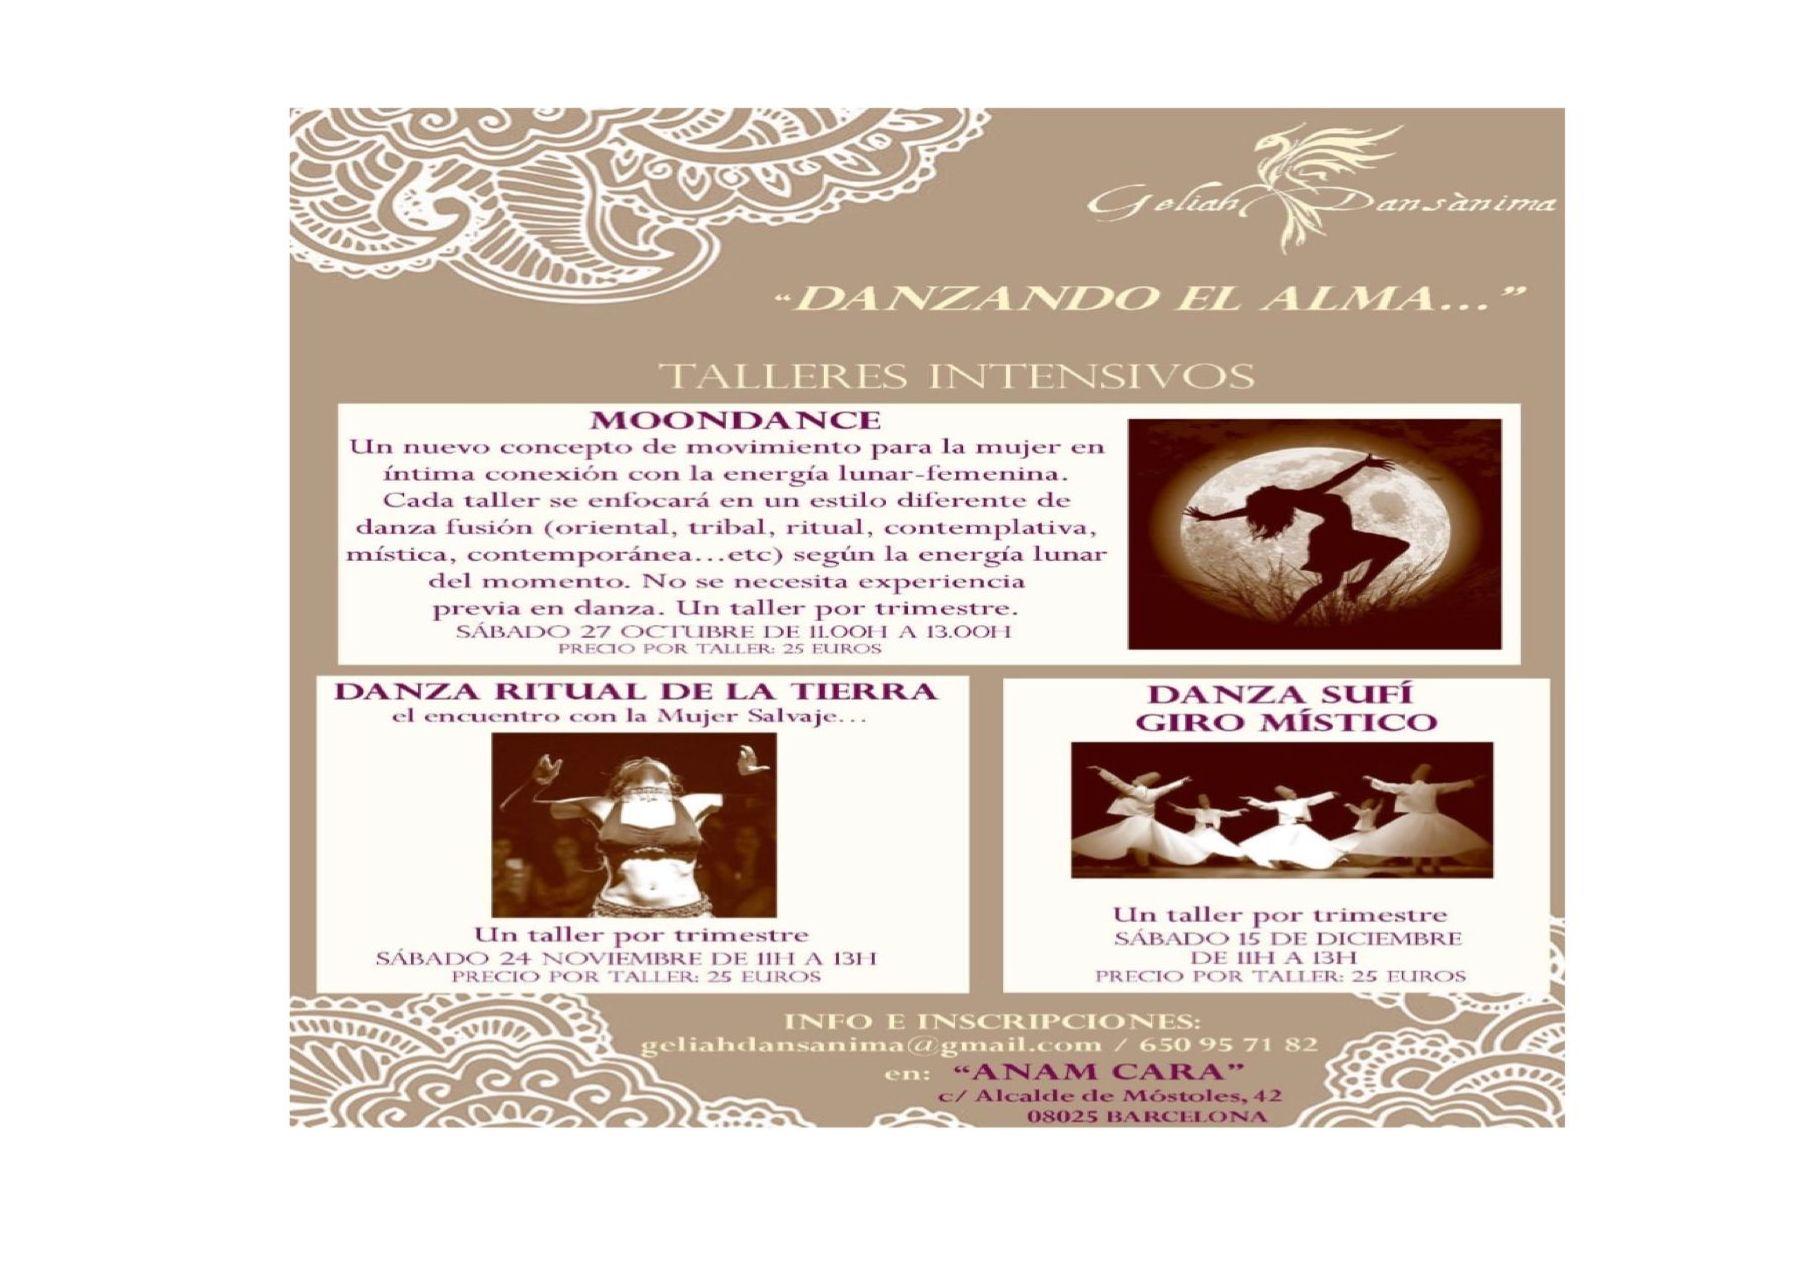 Moondance próximo Sábado 27 de octubre de 11h a 13h